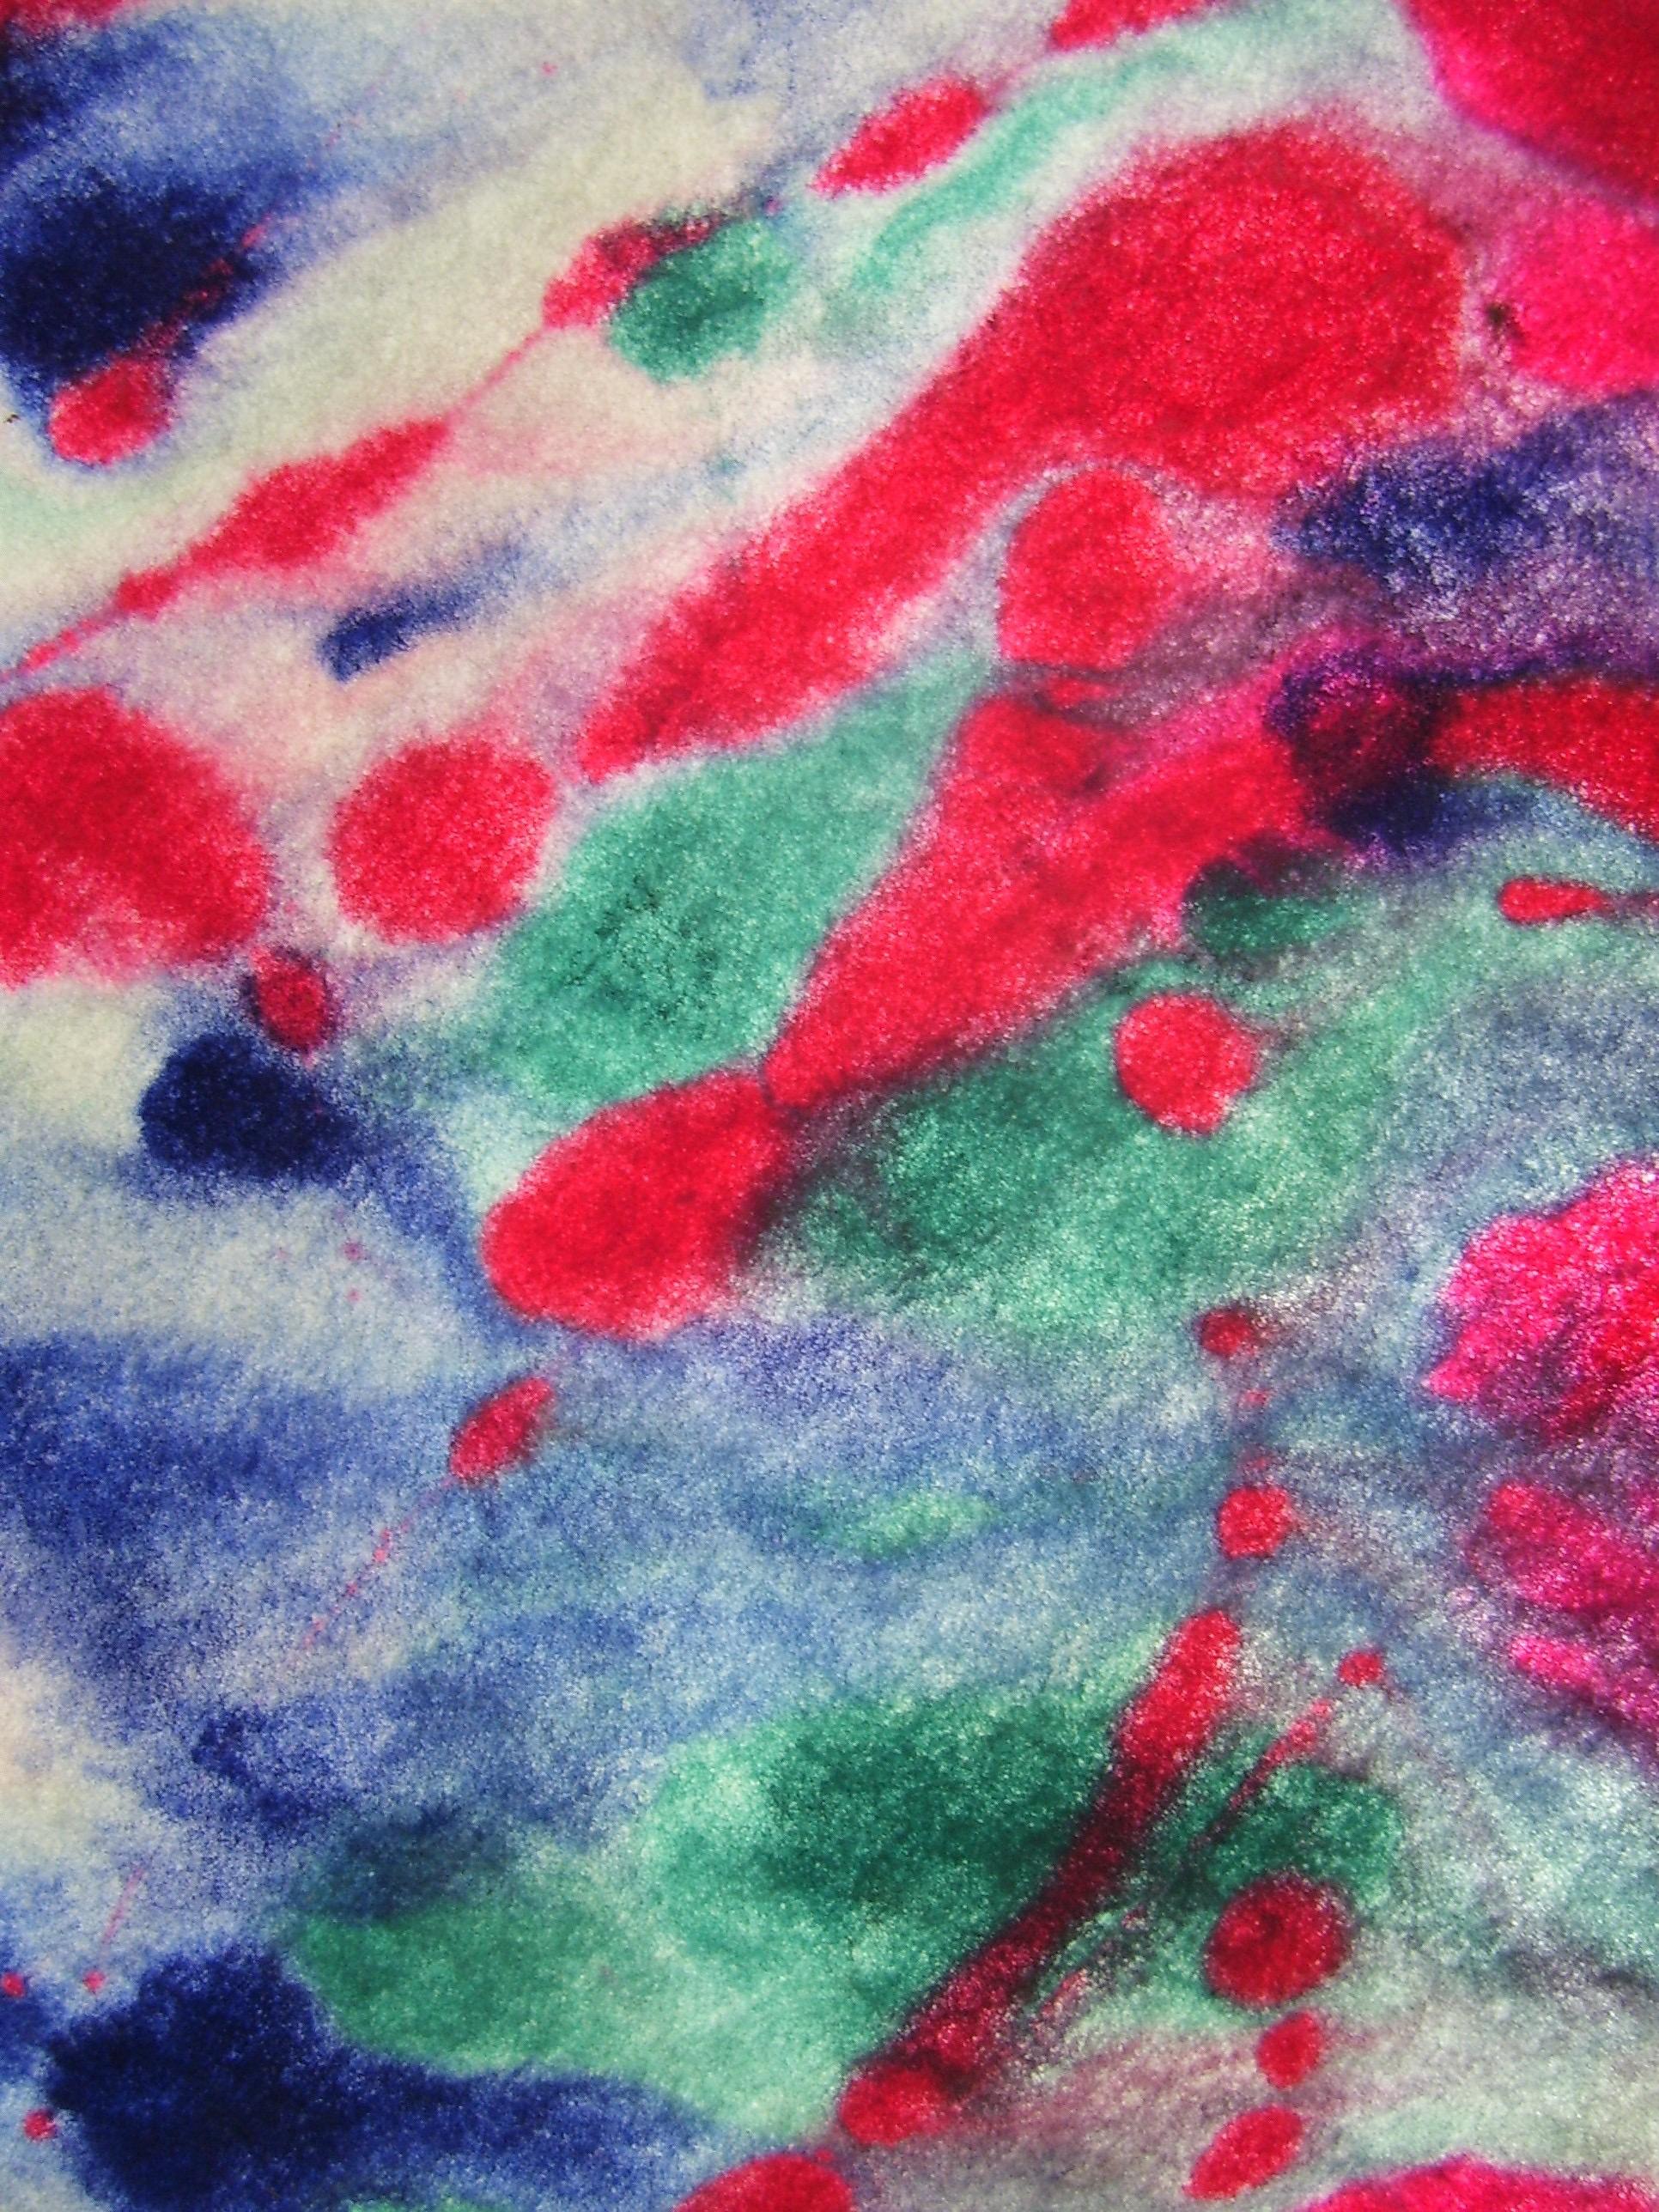 Painting on fibres 3 .jpg